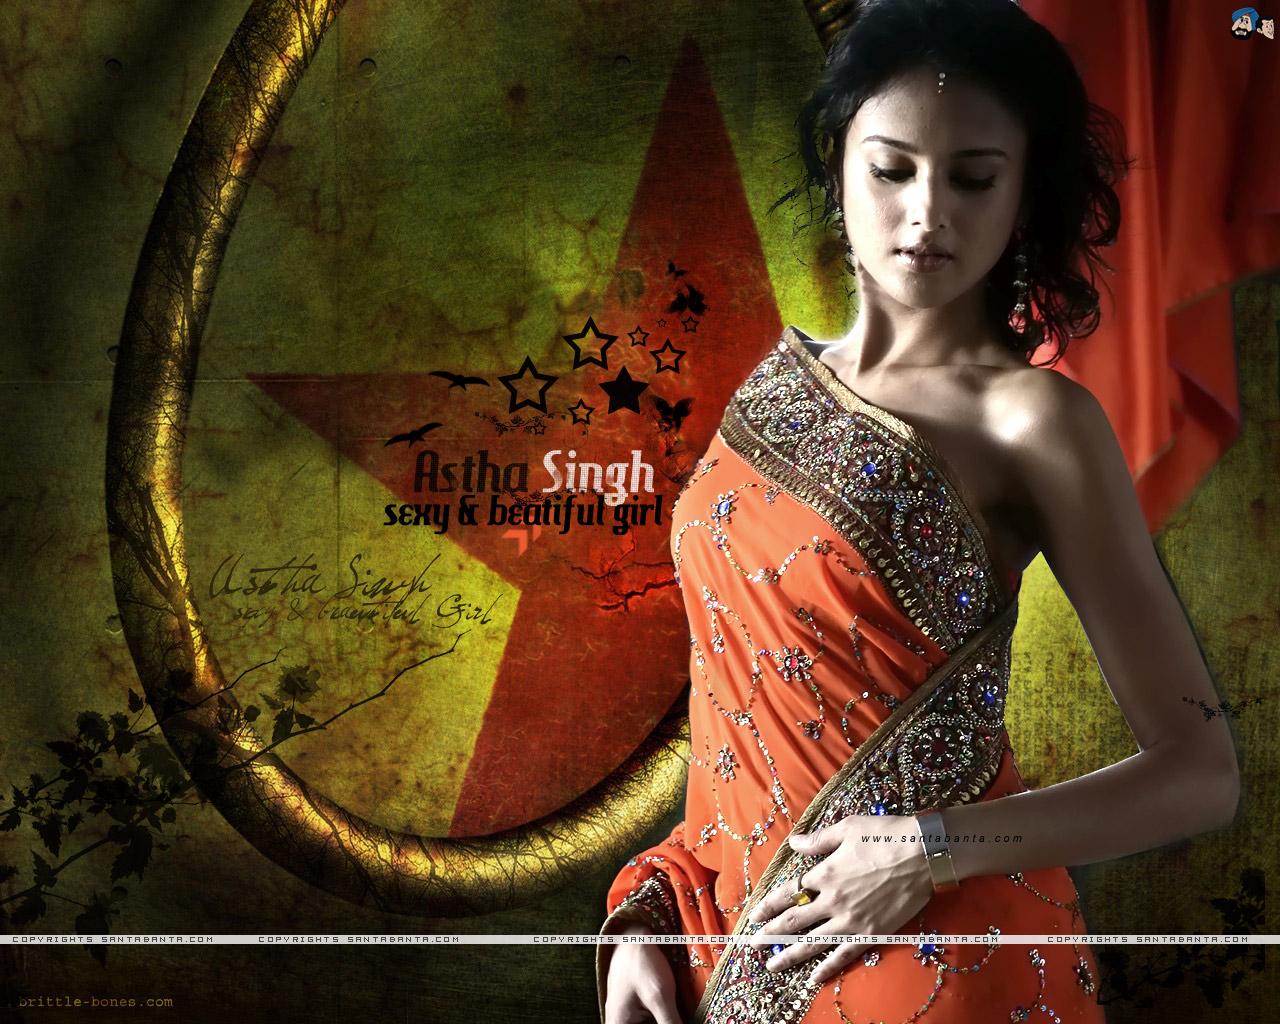 http://3.bp.blogspot.com/-iUixO012Ro8/T1xdO7KsoLI/AAAAAAAAJpA/Q-zUpRIZTmU/s1600/Astha+Singhal+Wallpaper13.jpg